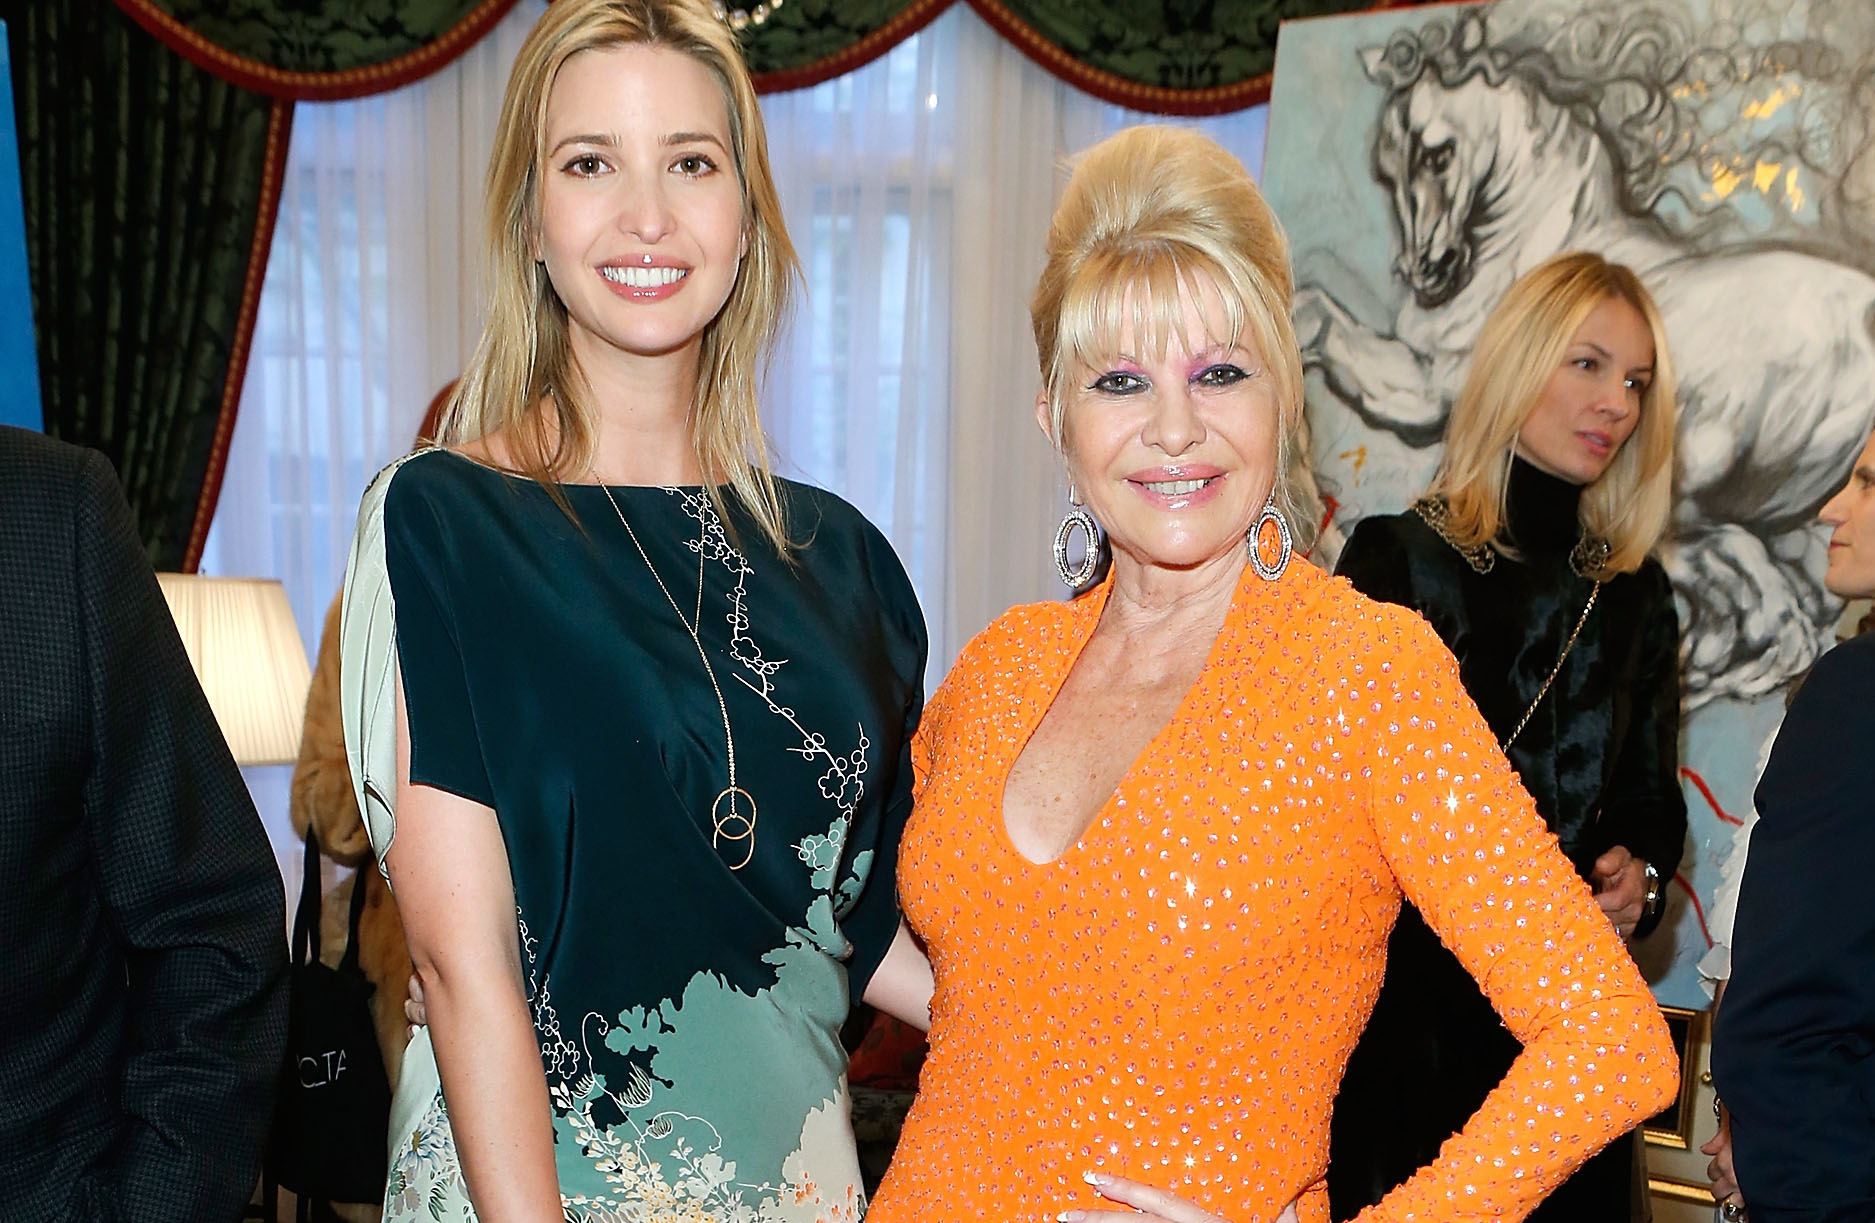 Who is Ivanka Trump's mom? - CBS News